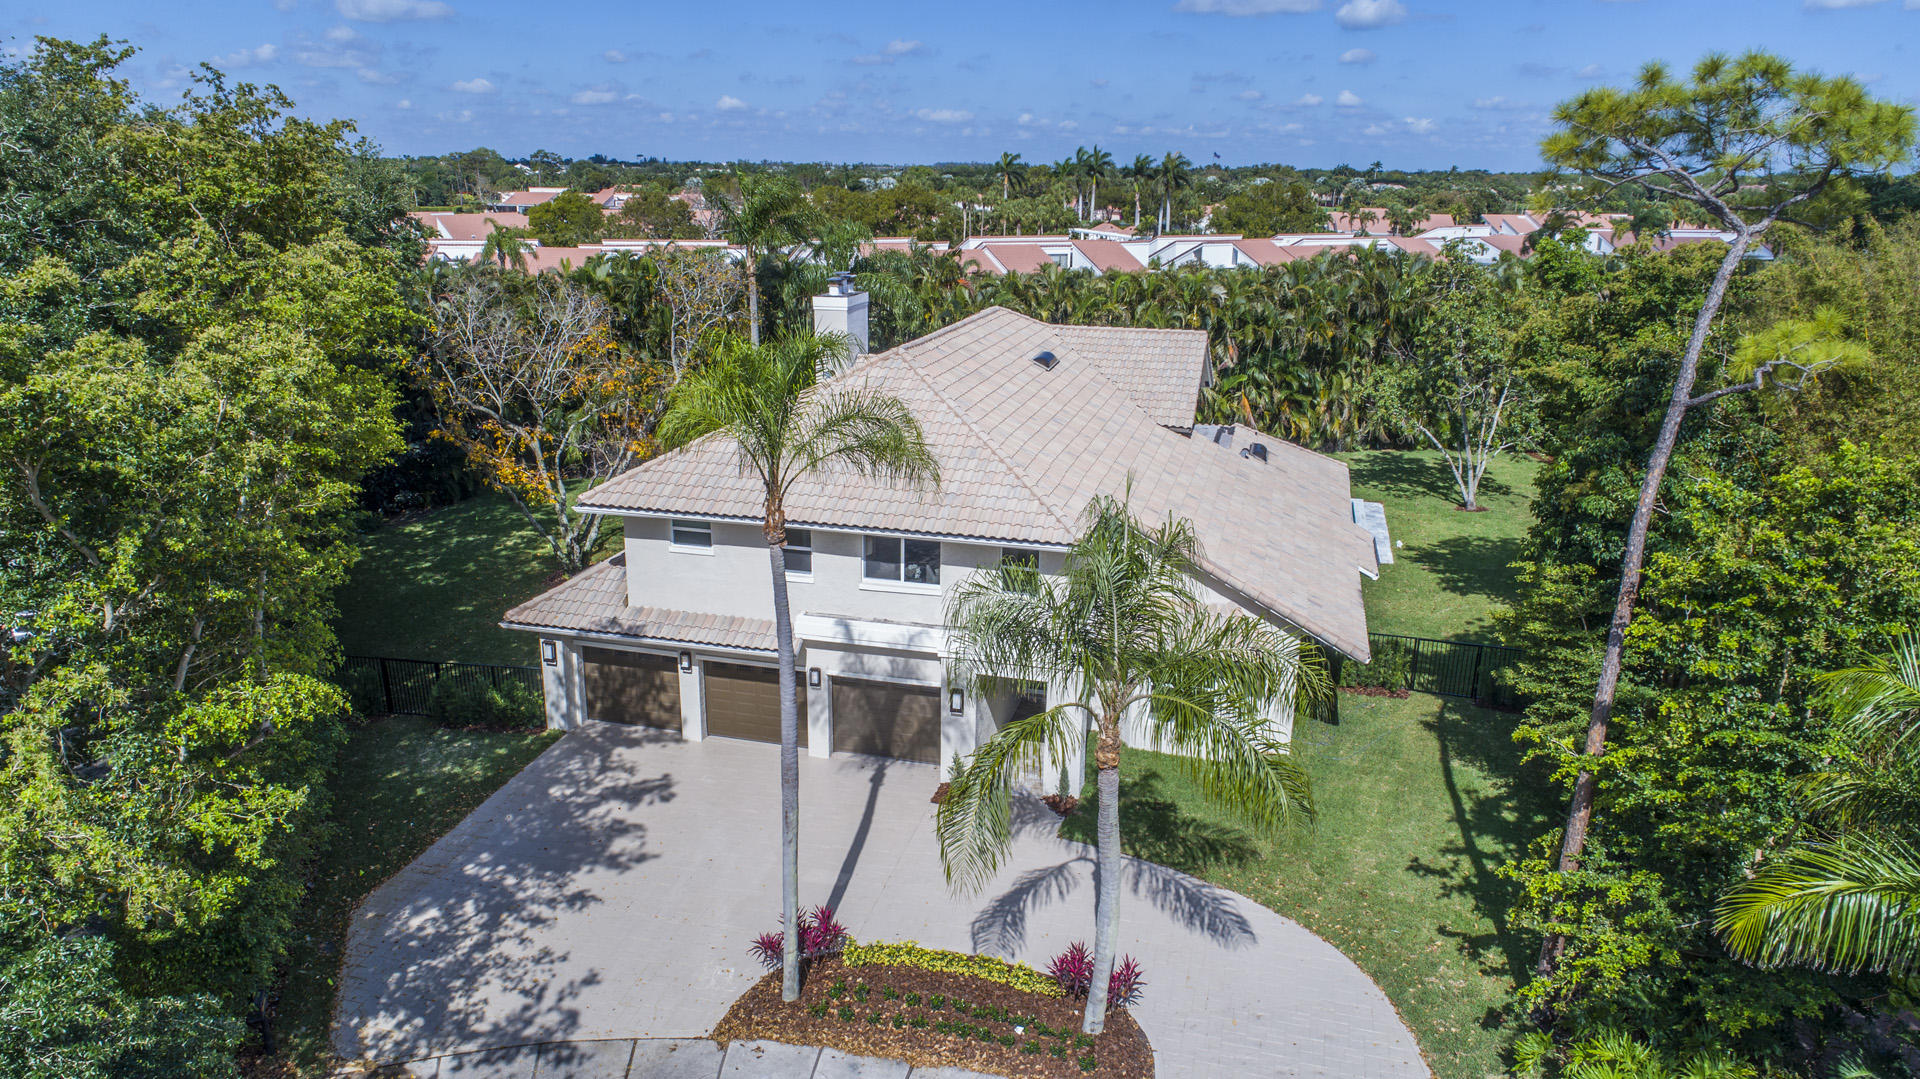 Photo of 3315 St Charles Circle, Boca Raton, FL 33434